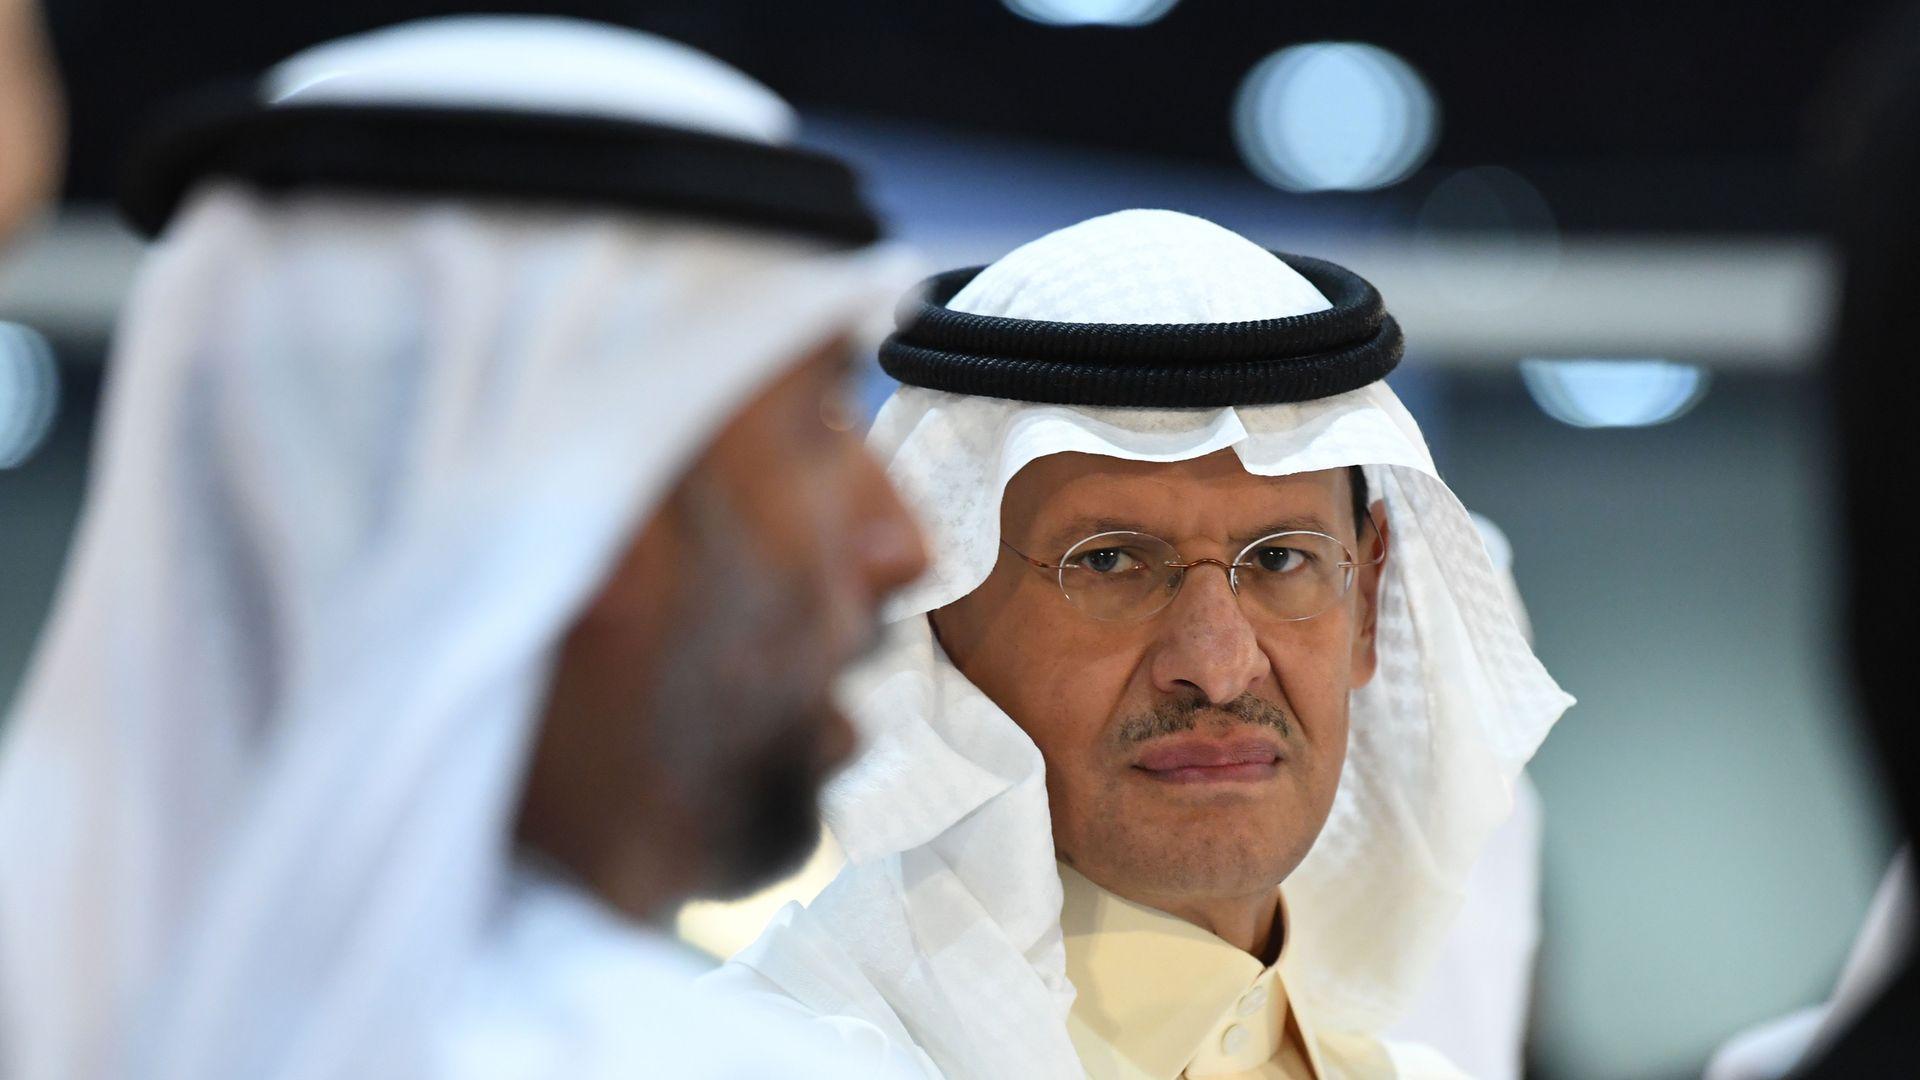 Photo of the Saudi Arabia's new energy minister, Prince Abdulaziz bin Salman